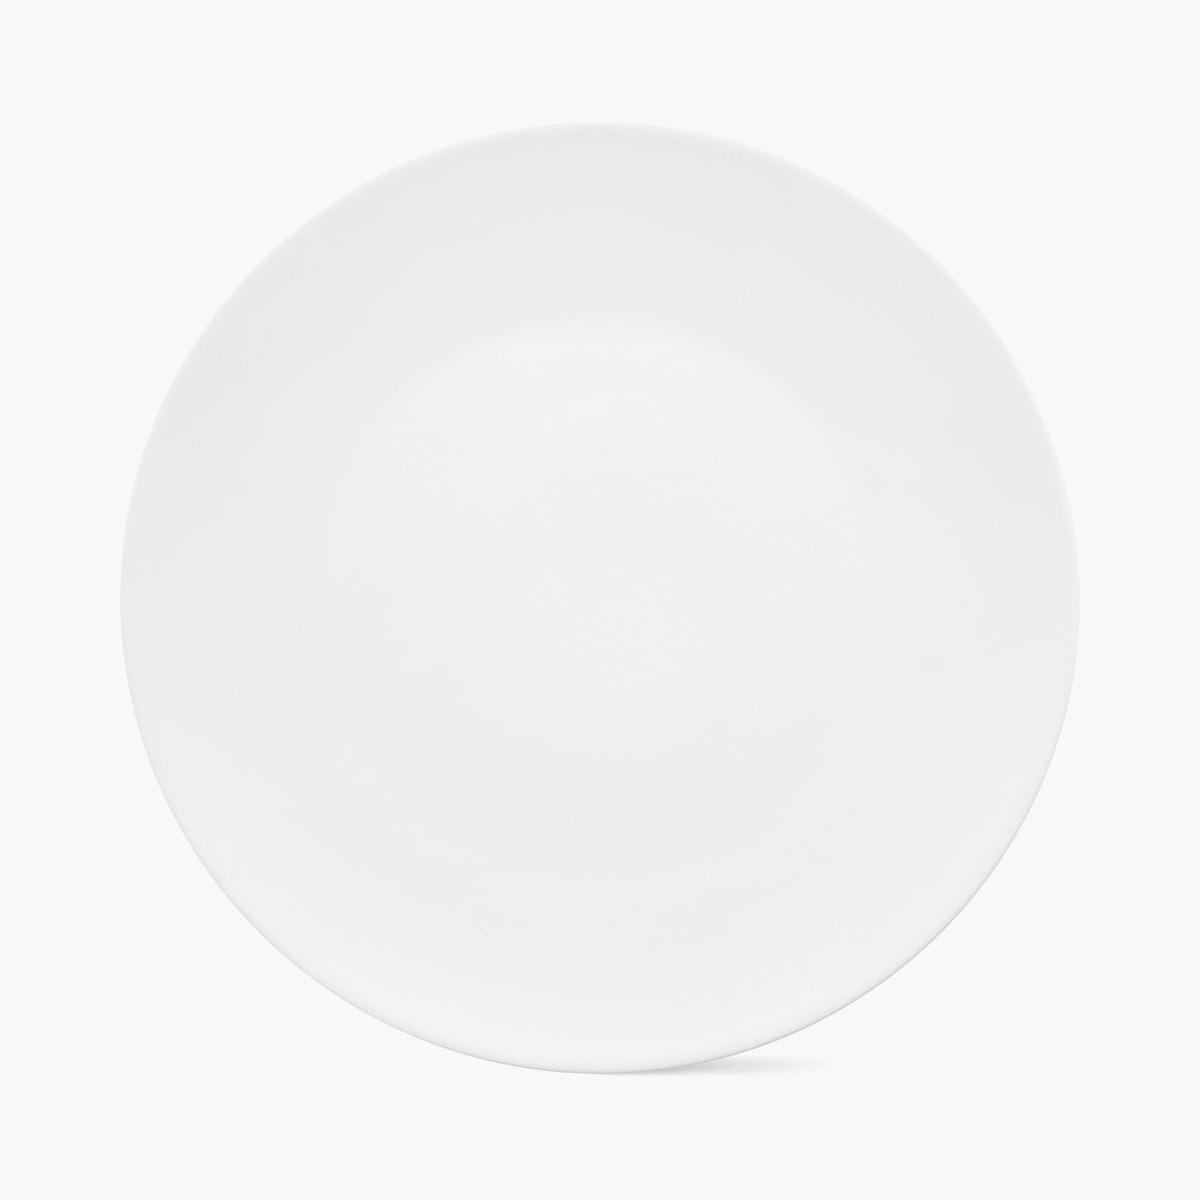 TAC 02 Dinner Plate